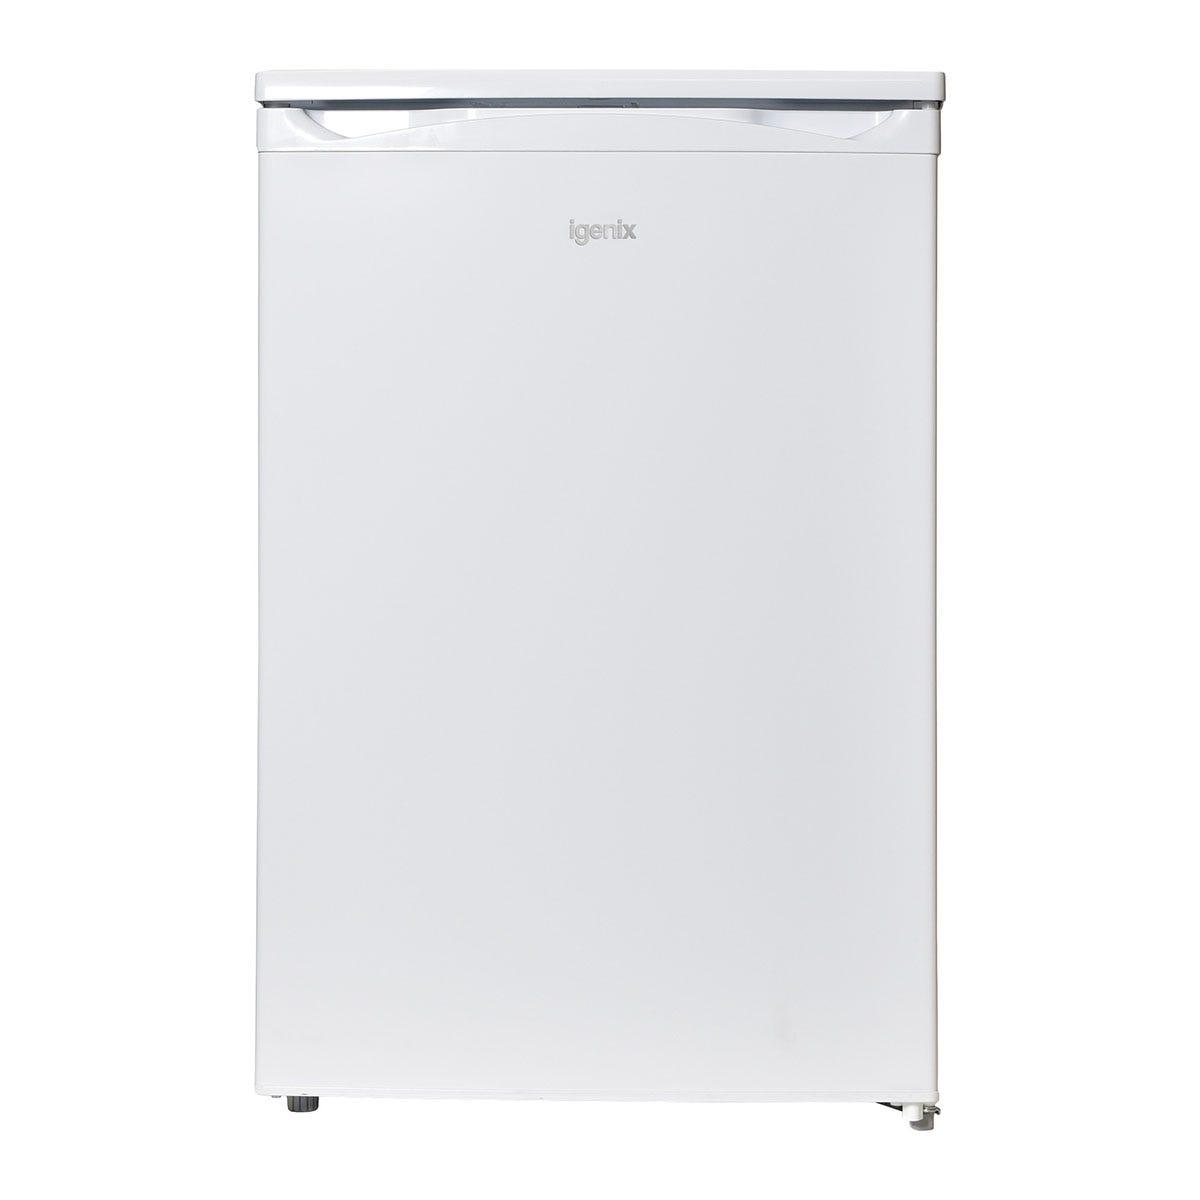 Igenix IG355W Under Counter 55cm Freezer - White